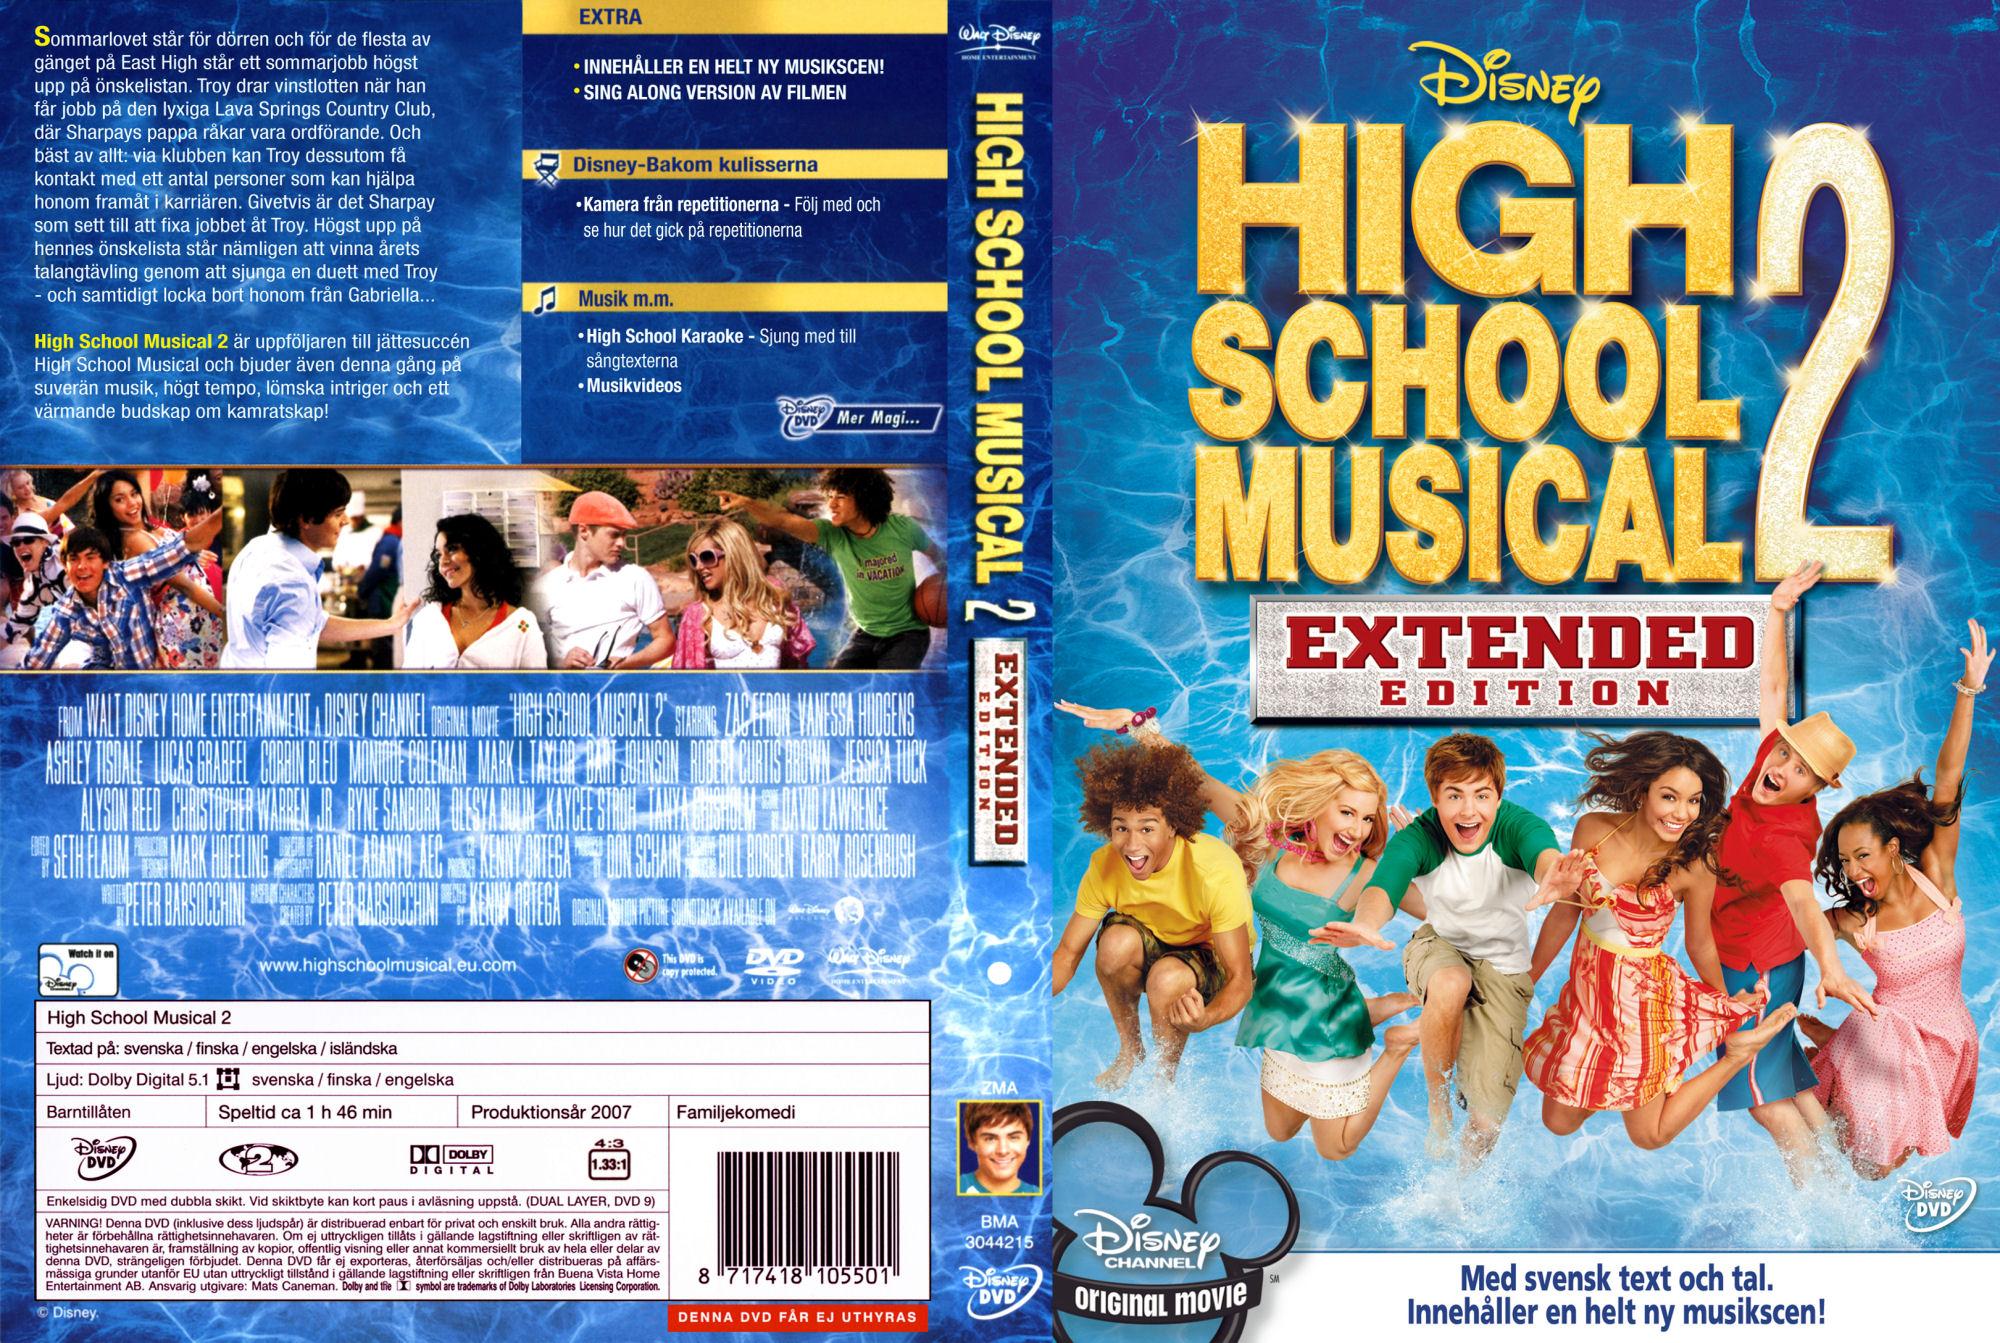 Hsm2 the movie